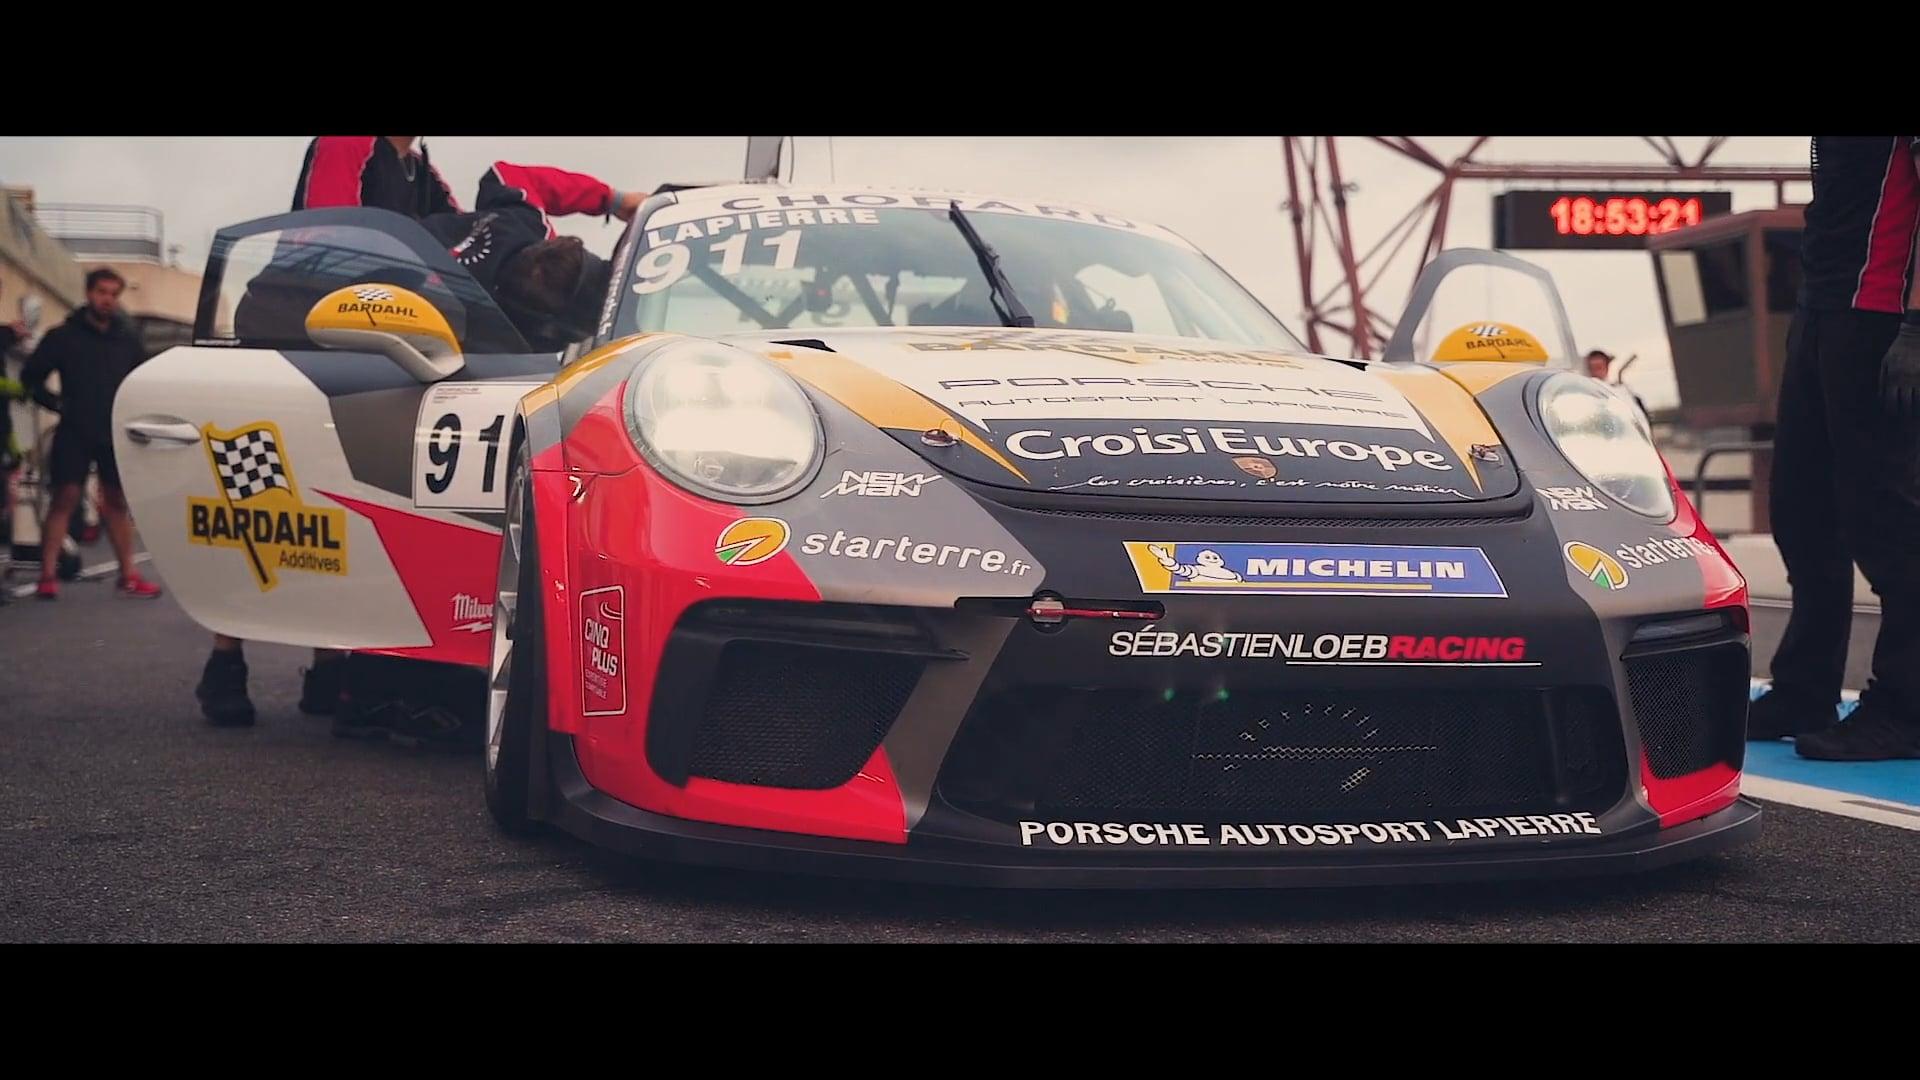 Porsche Carrera Cup - Finale 2019 au Paul Ricard